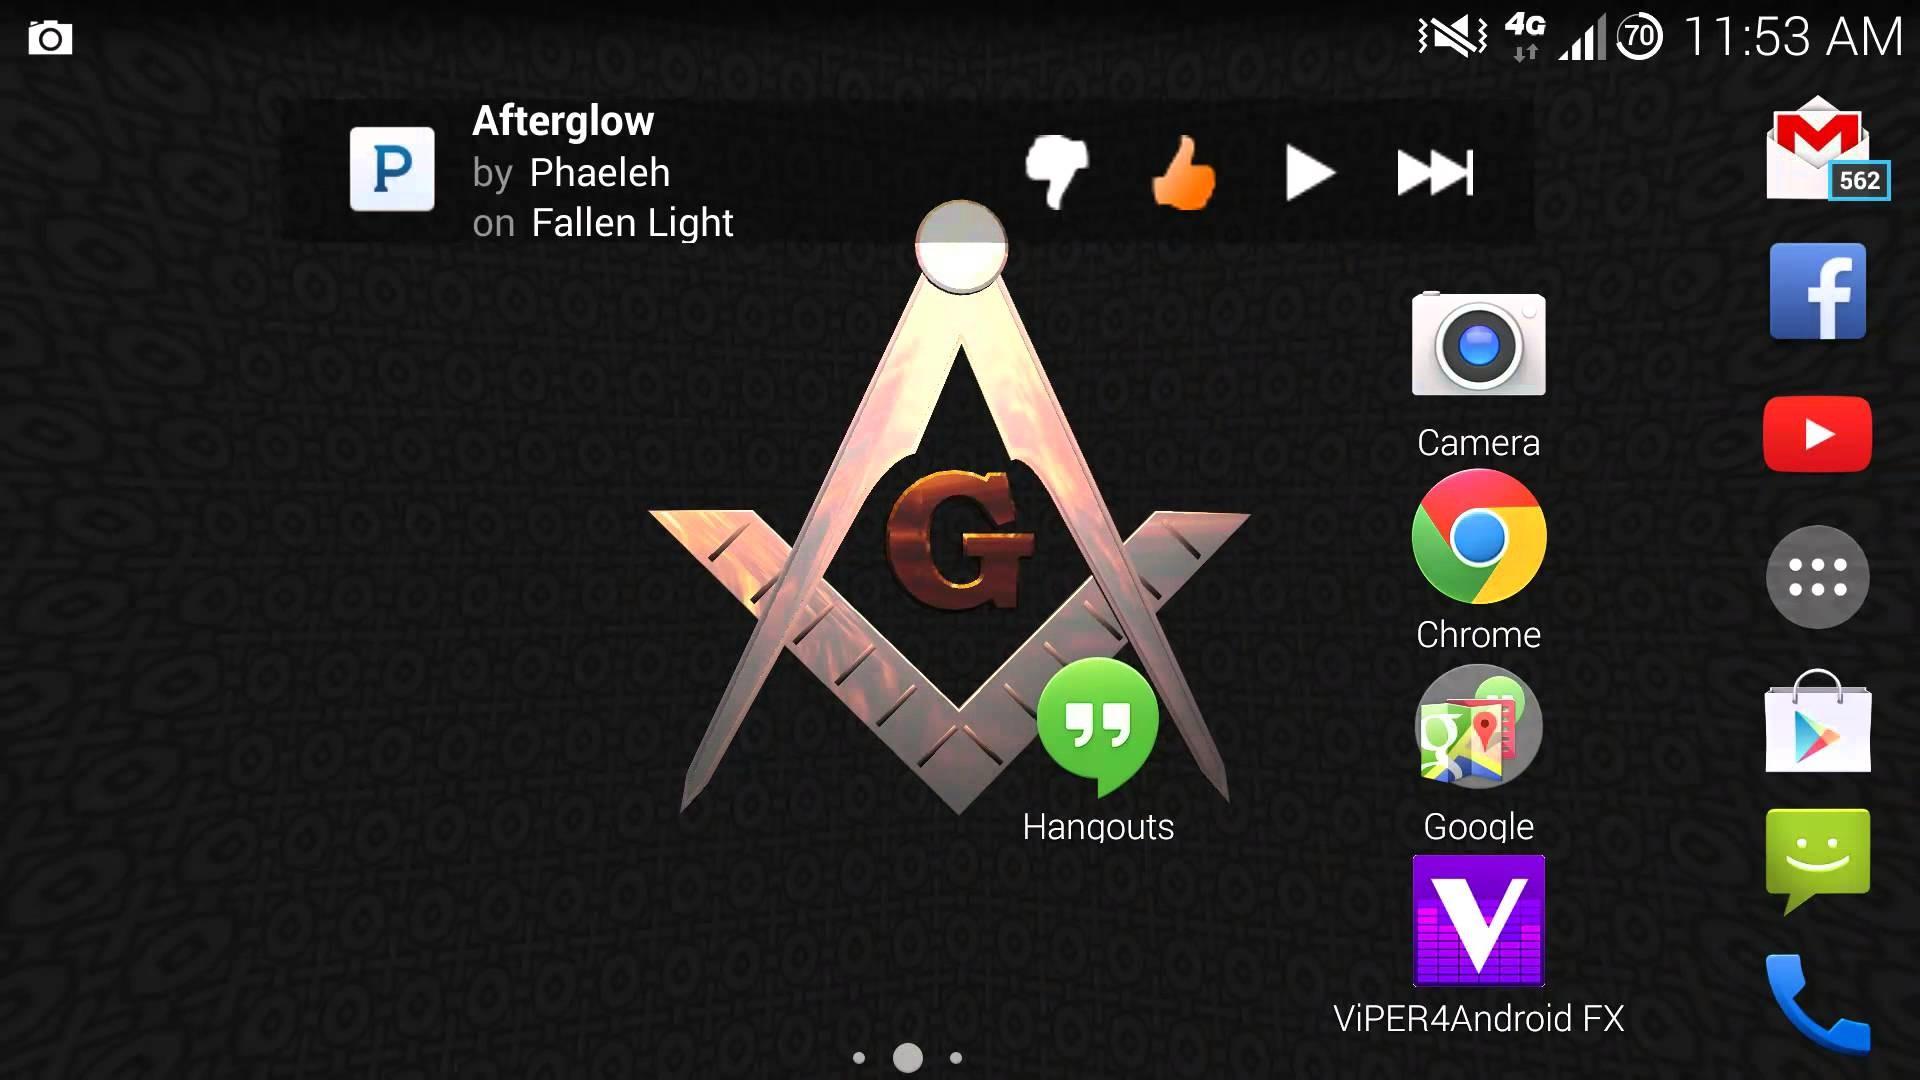 … wallpaper wallpapersafari; download free masonic backgrounds pixelstalk  net …